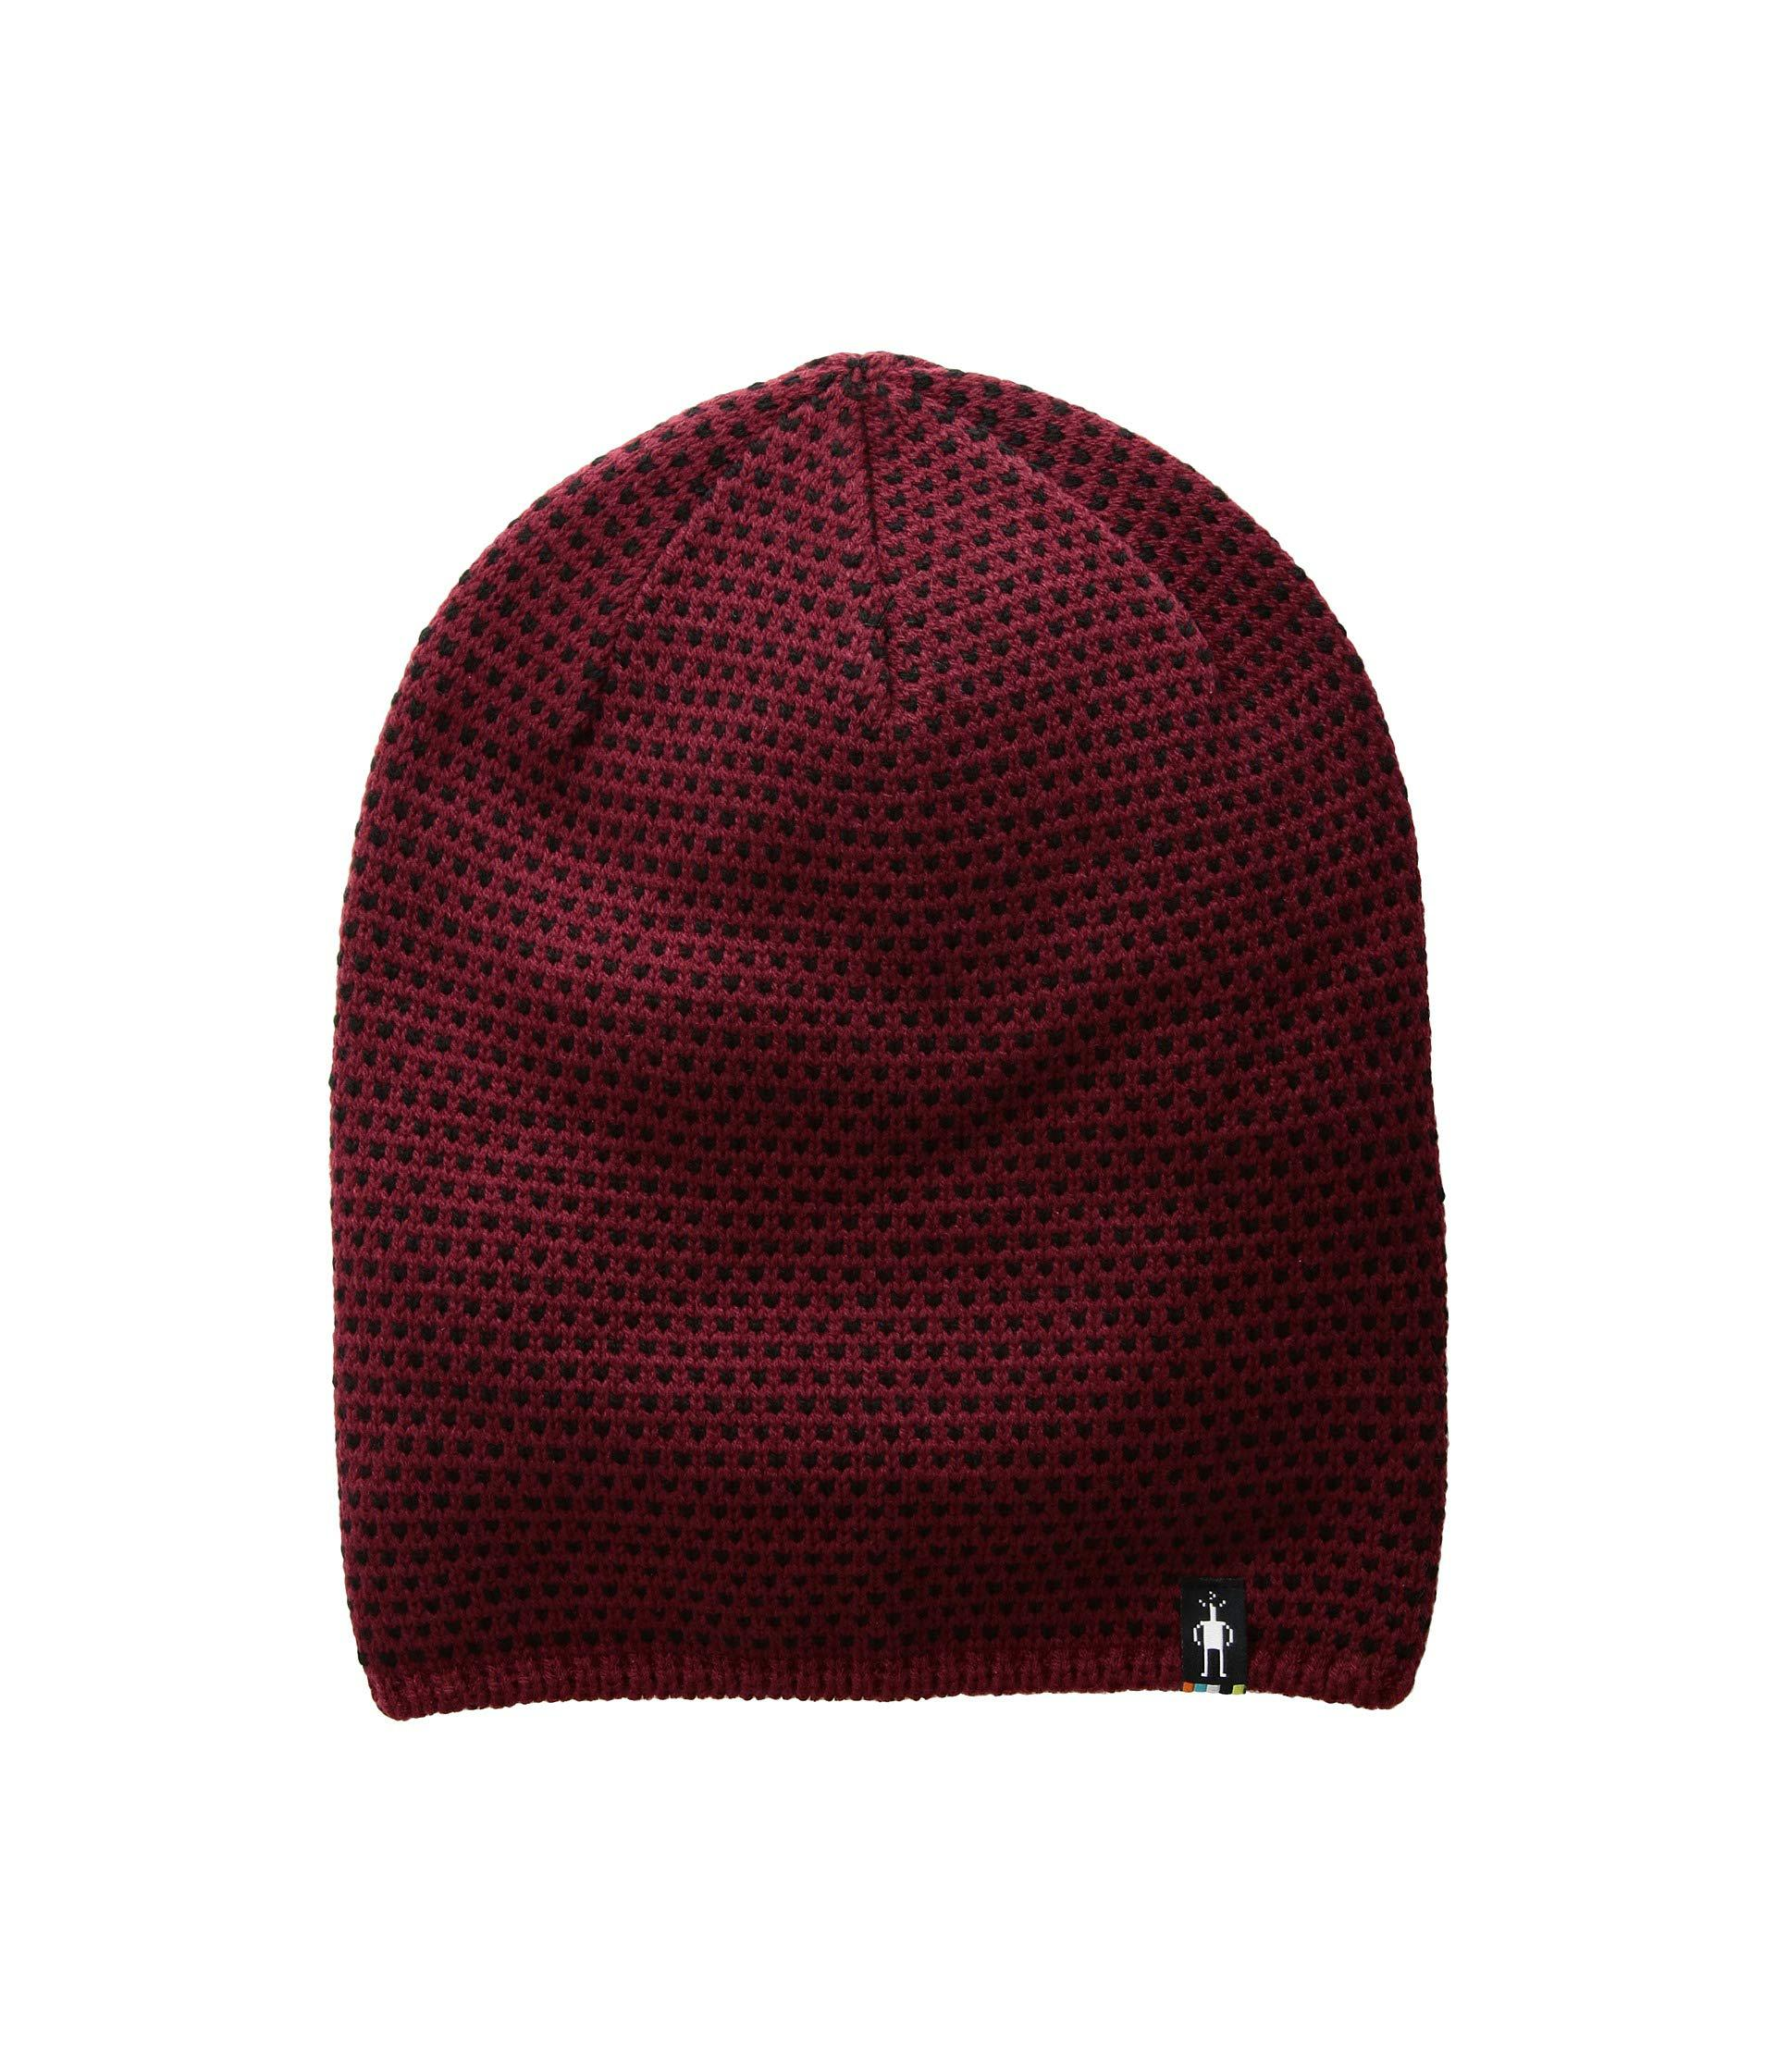 b045d1ce433 Lyst - Smartwool Diamond Cascade Hat (tibetan Red) Beanies in Red ...